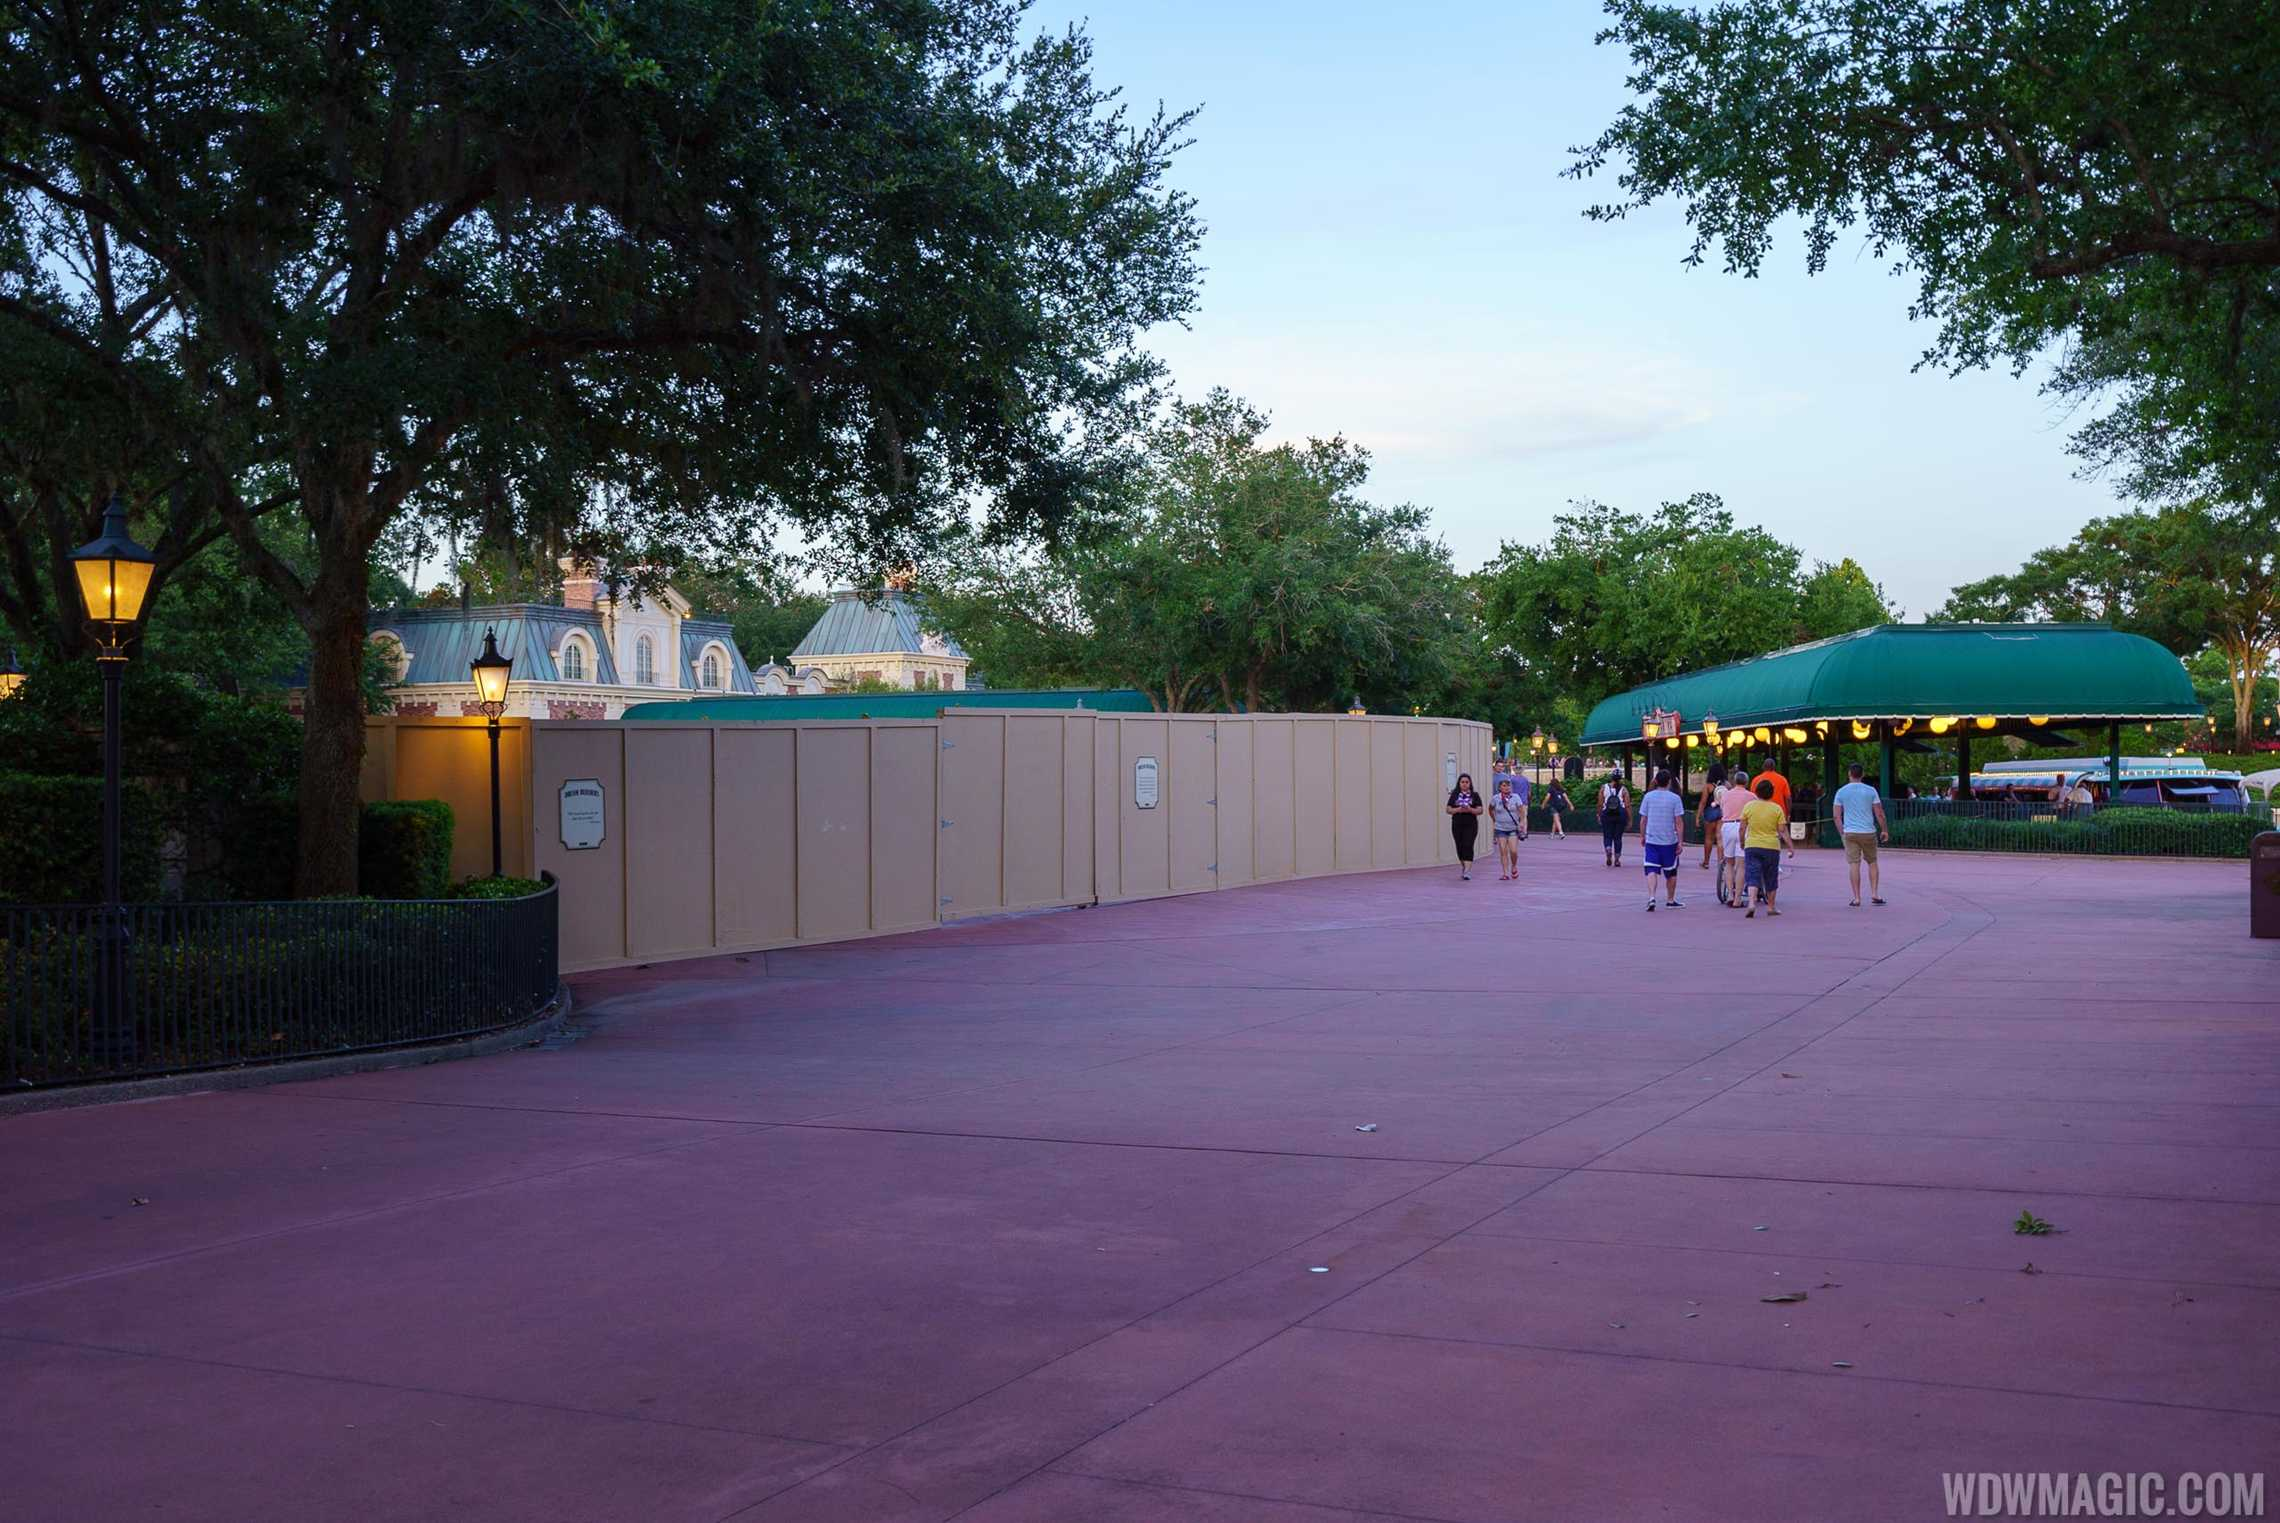 Disney Skyliner construction at Epcot